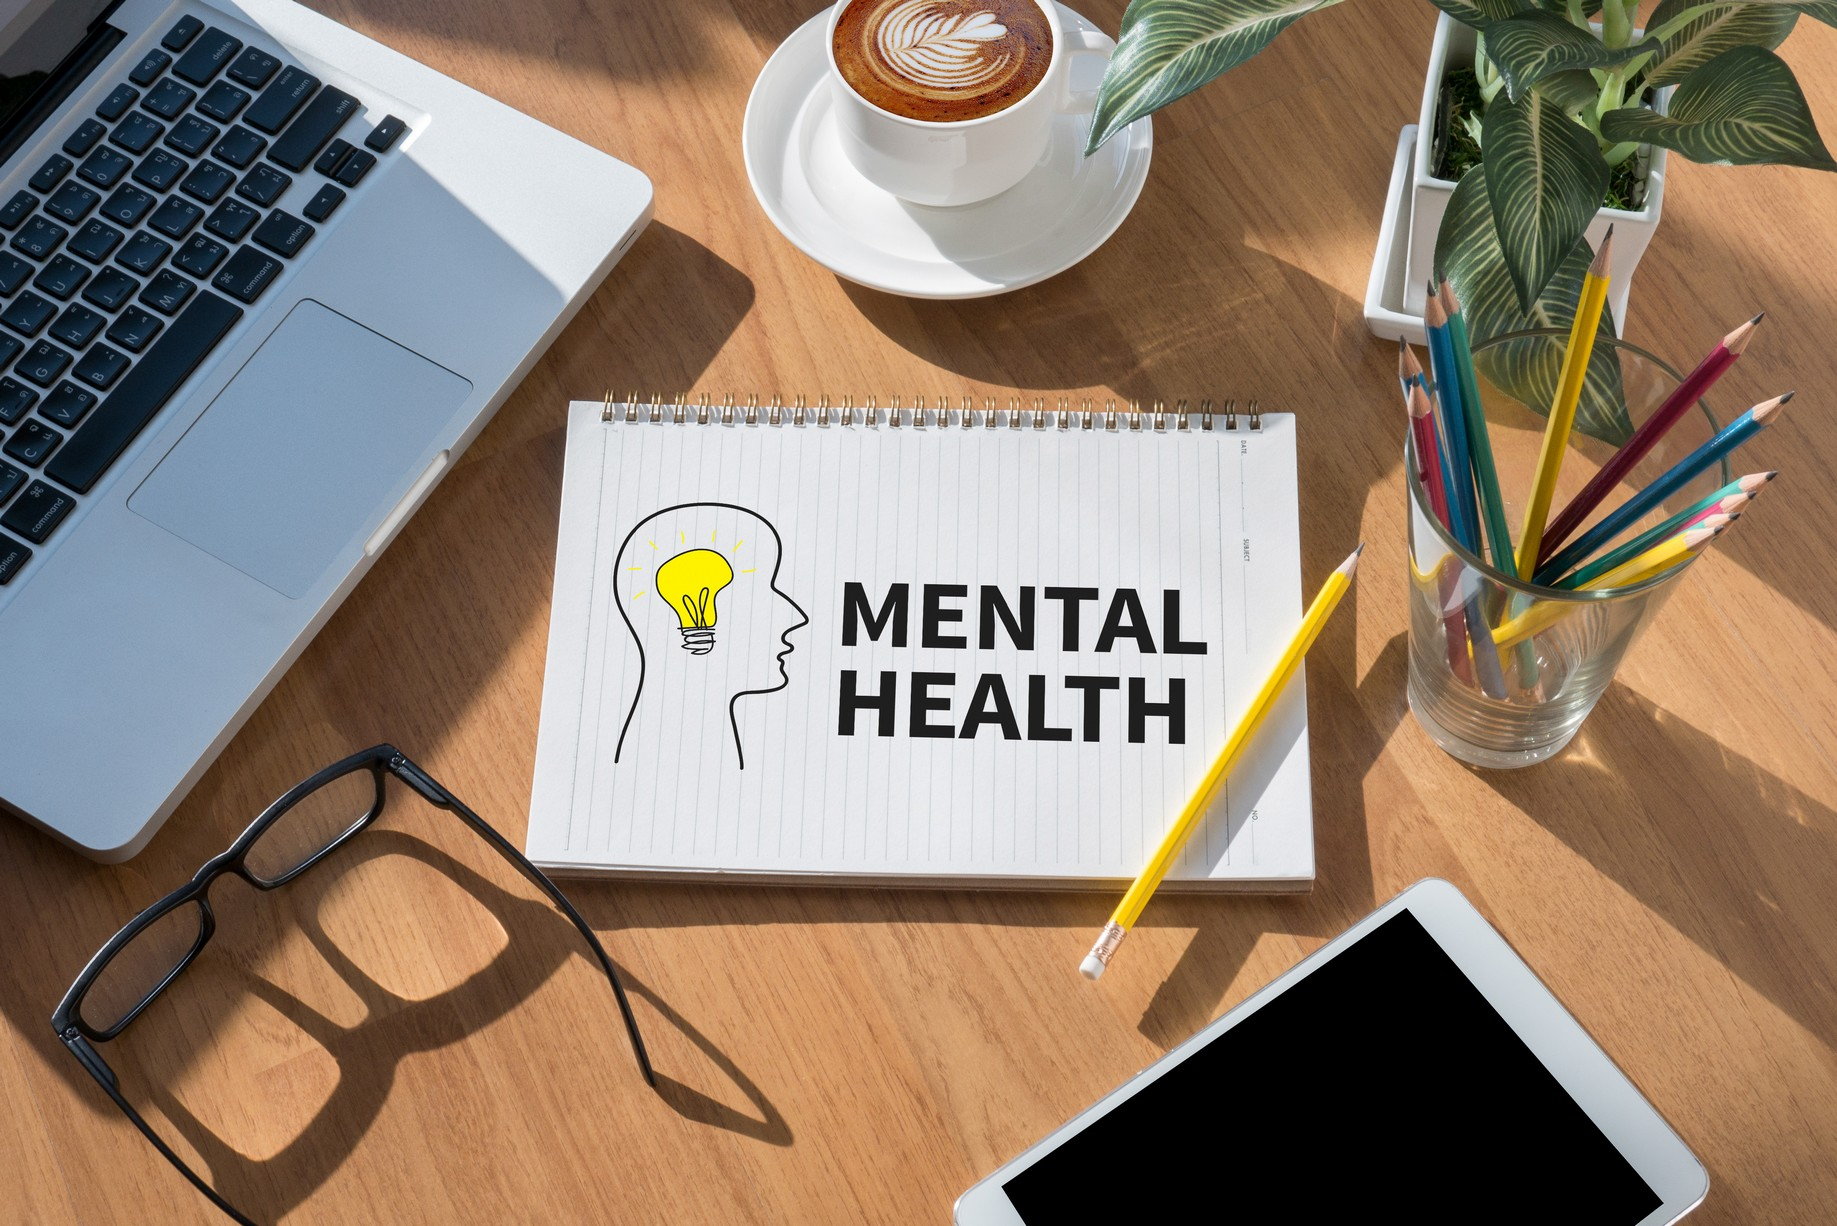 Augusta Health and Wellness | Break Room | Corporate Wellness Program | Healthy Options